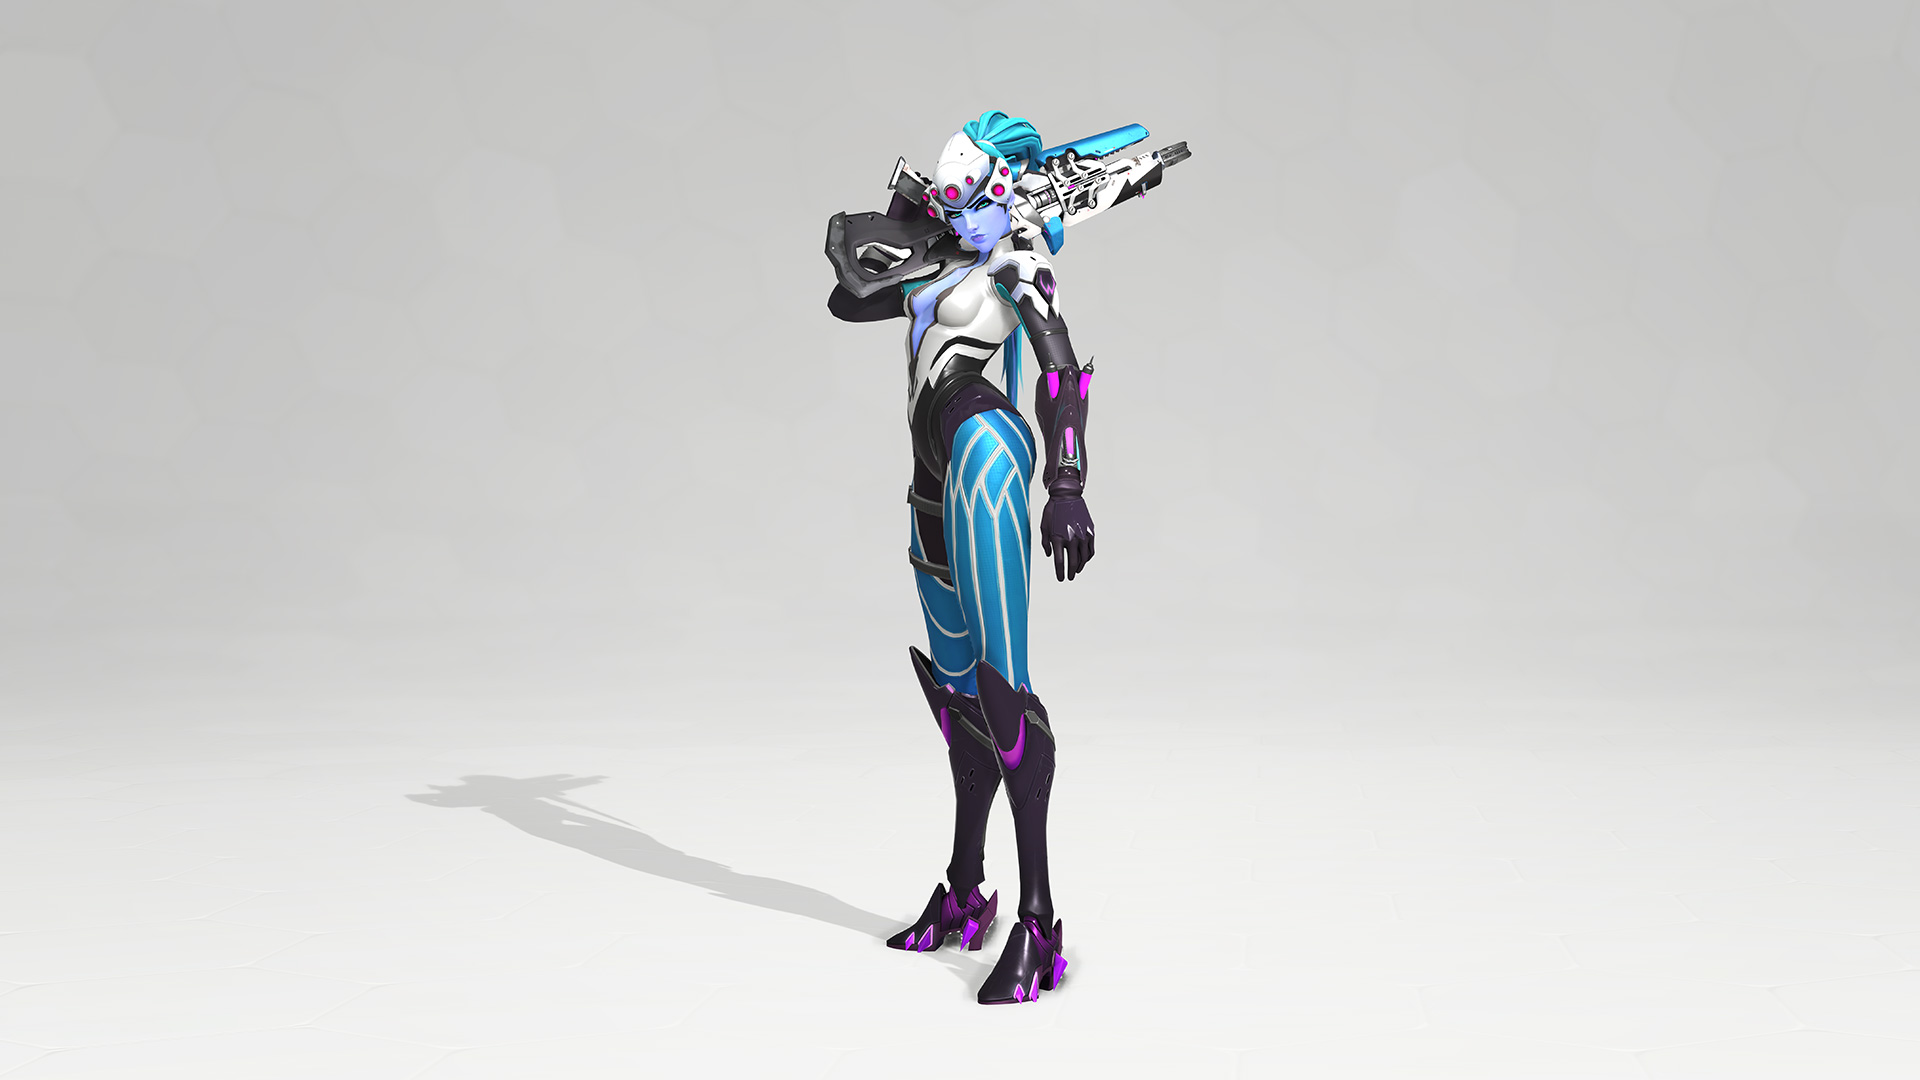 New Overwatch Skins 2020.Anniversary Overwatch